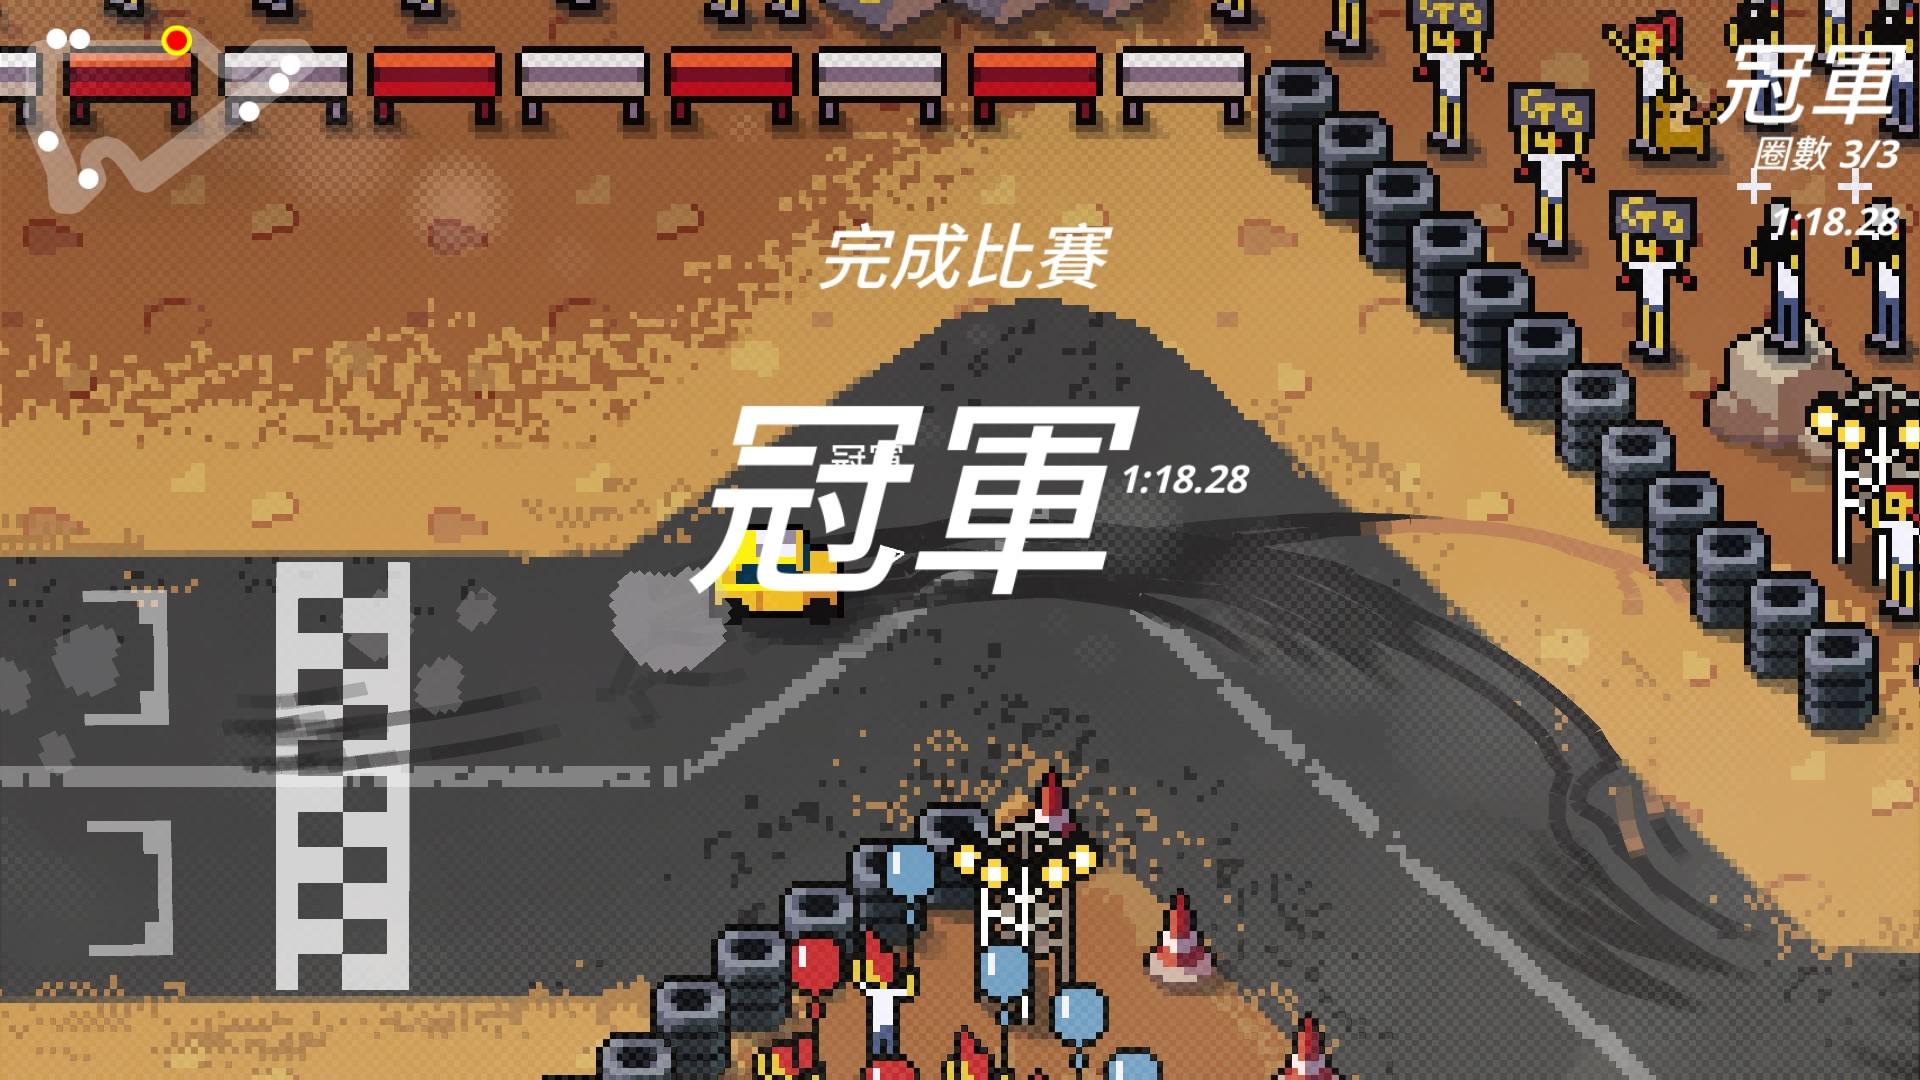 超級像素賽車, Super Pixel Racers, PS4, GSE,